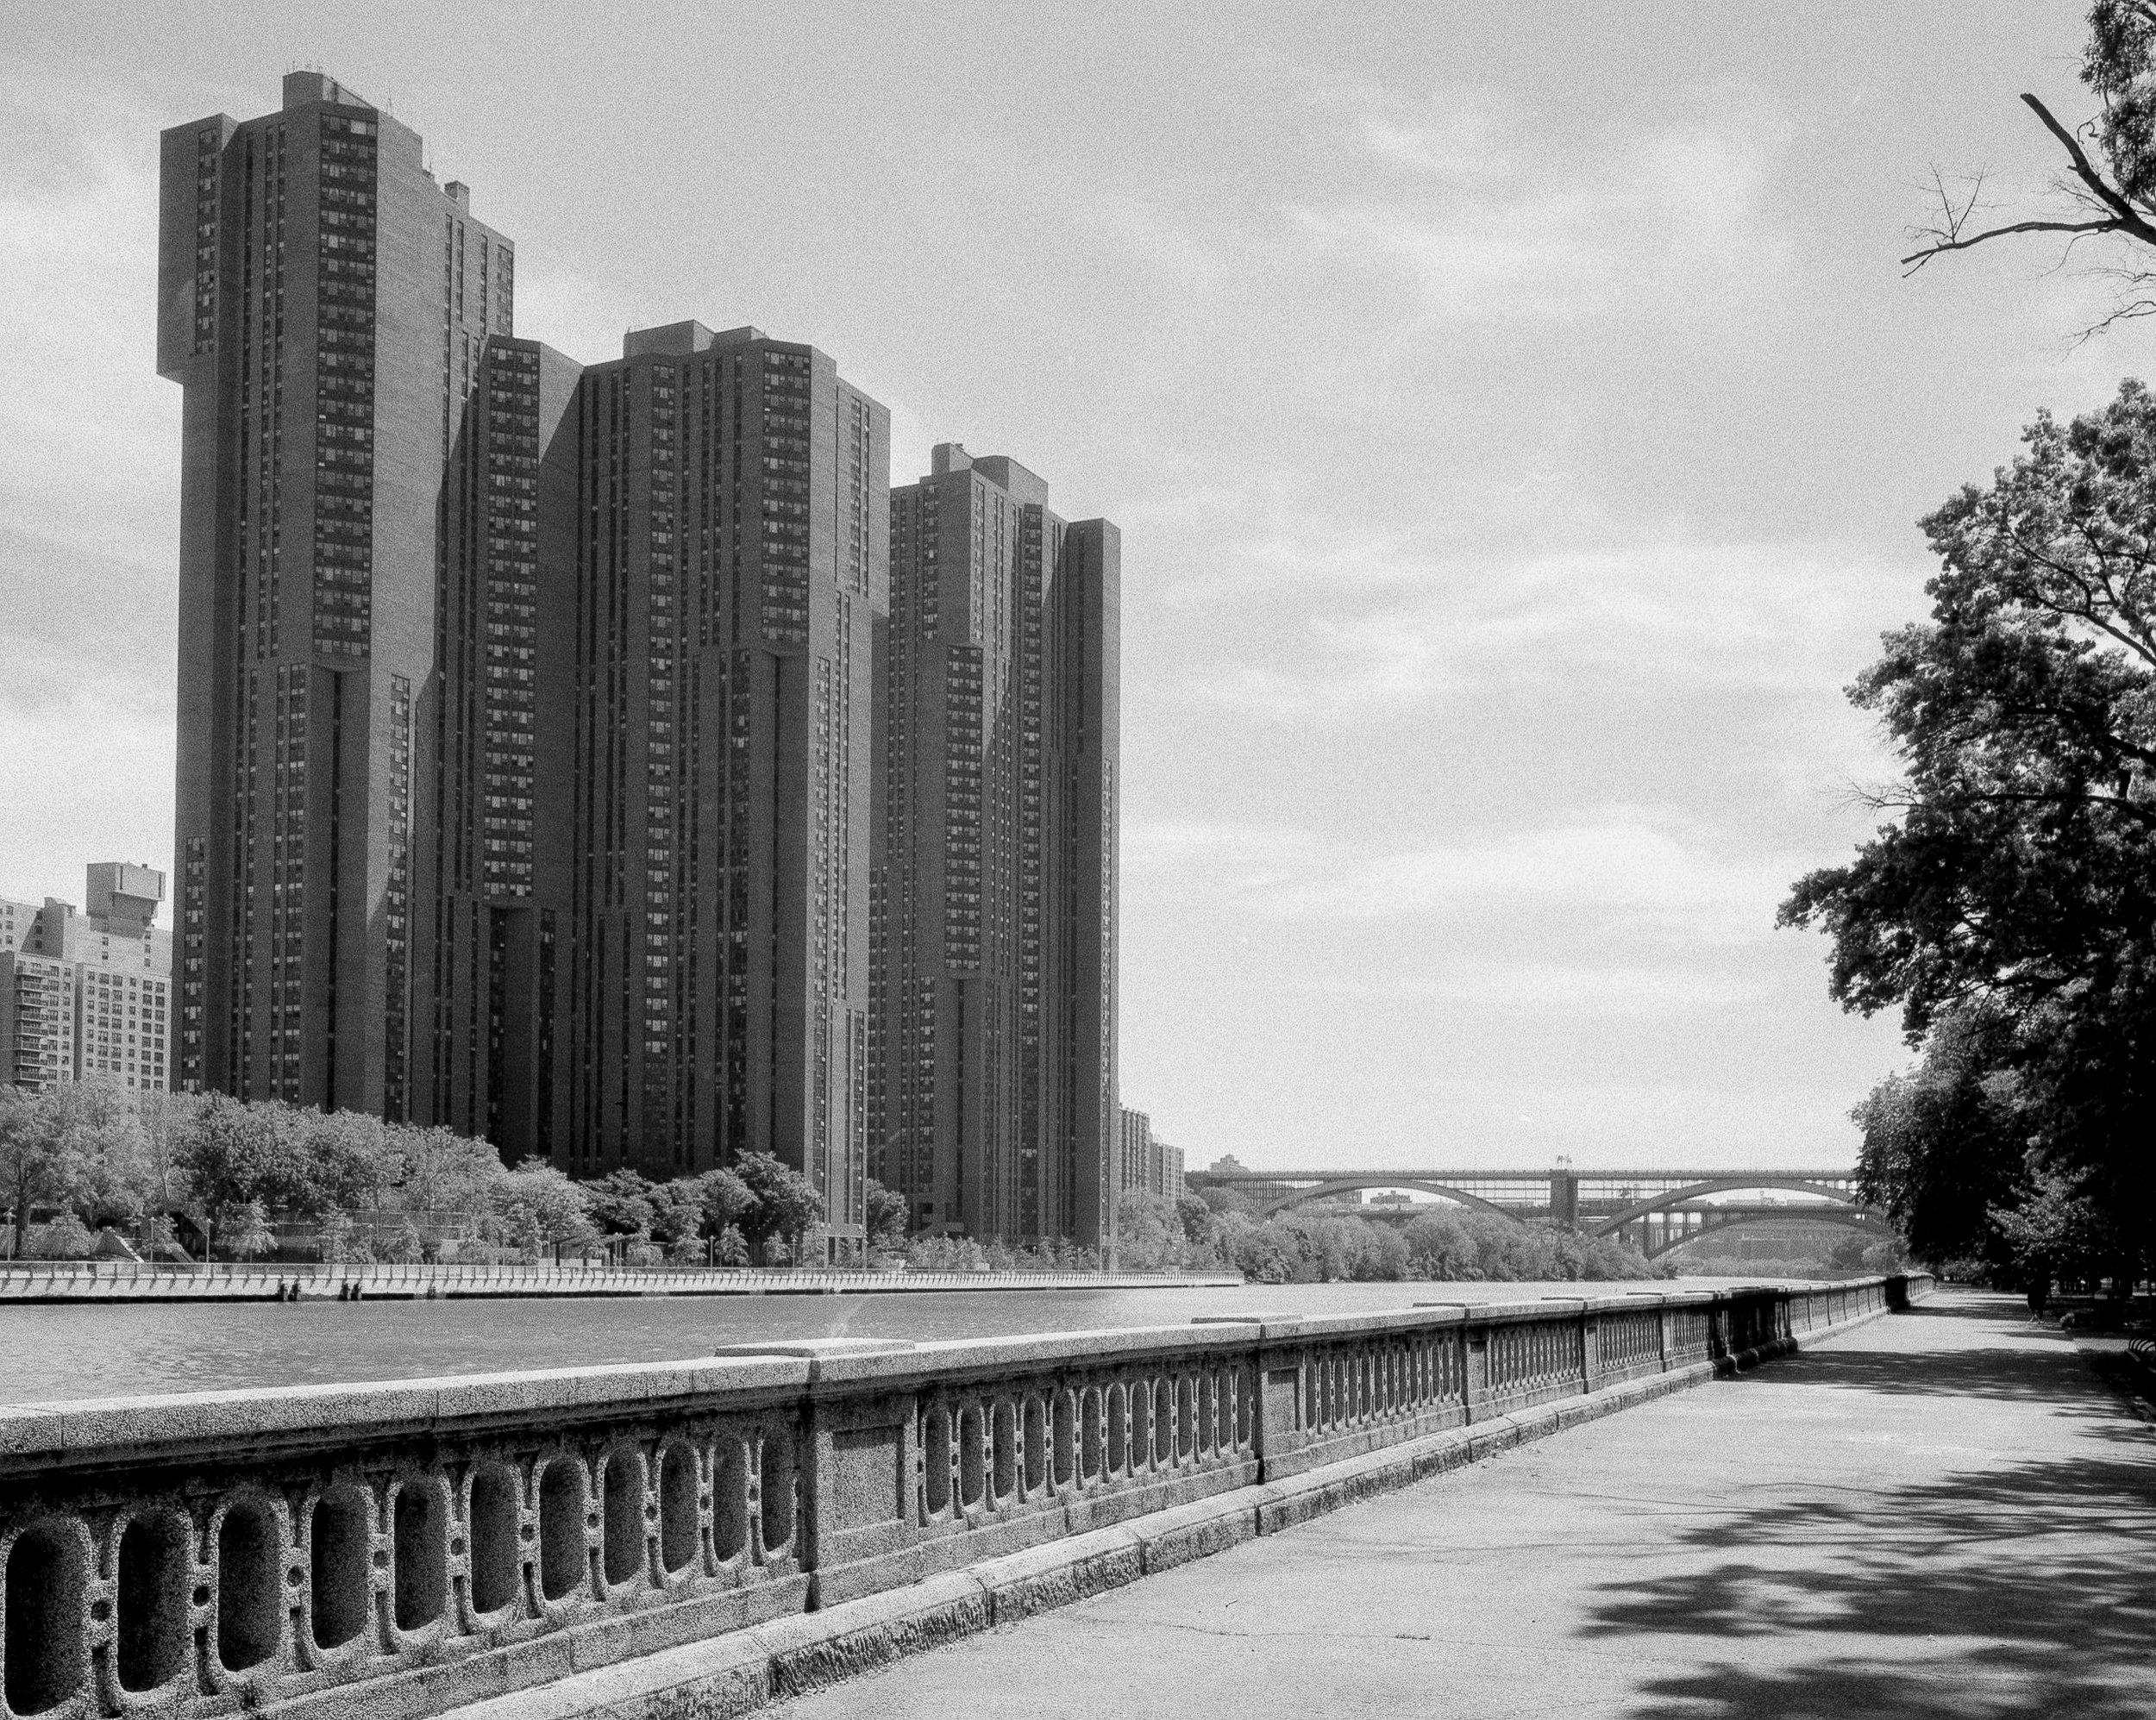 city045-2.jpg